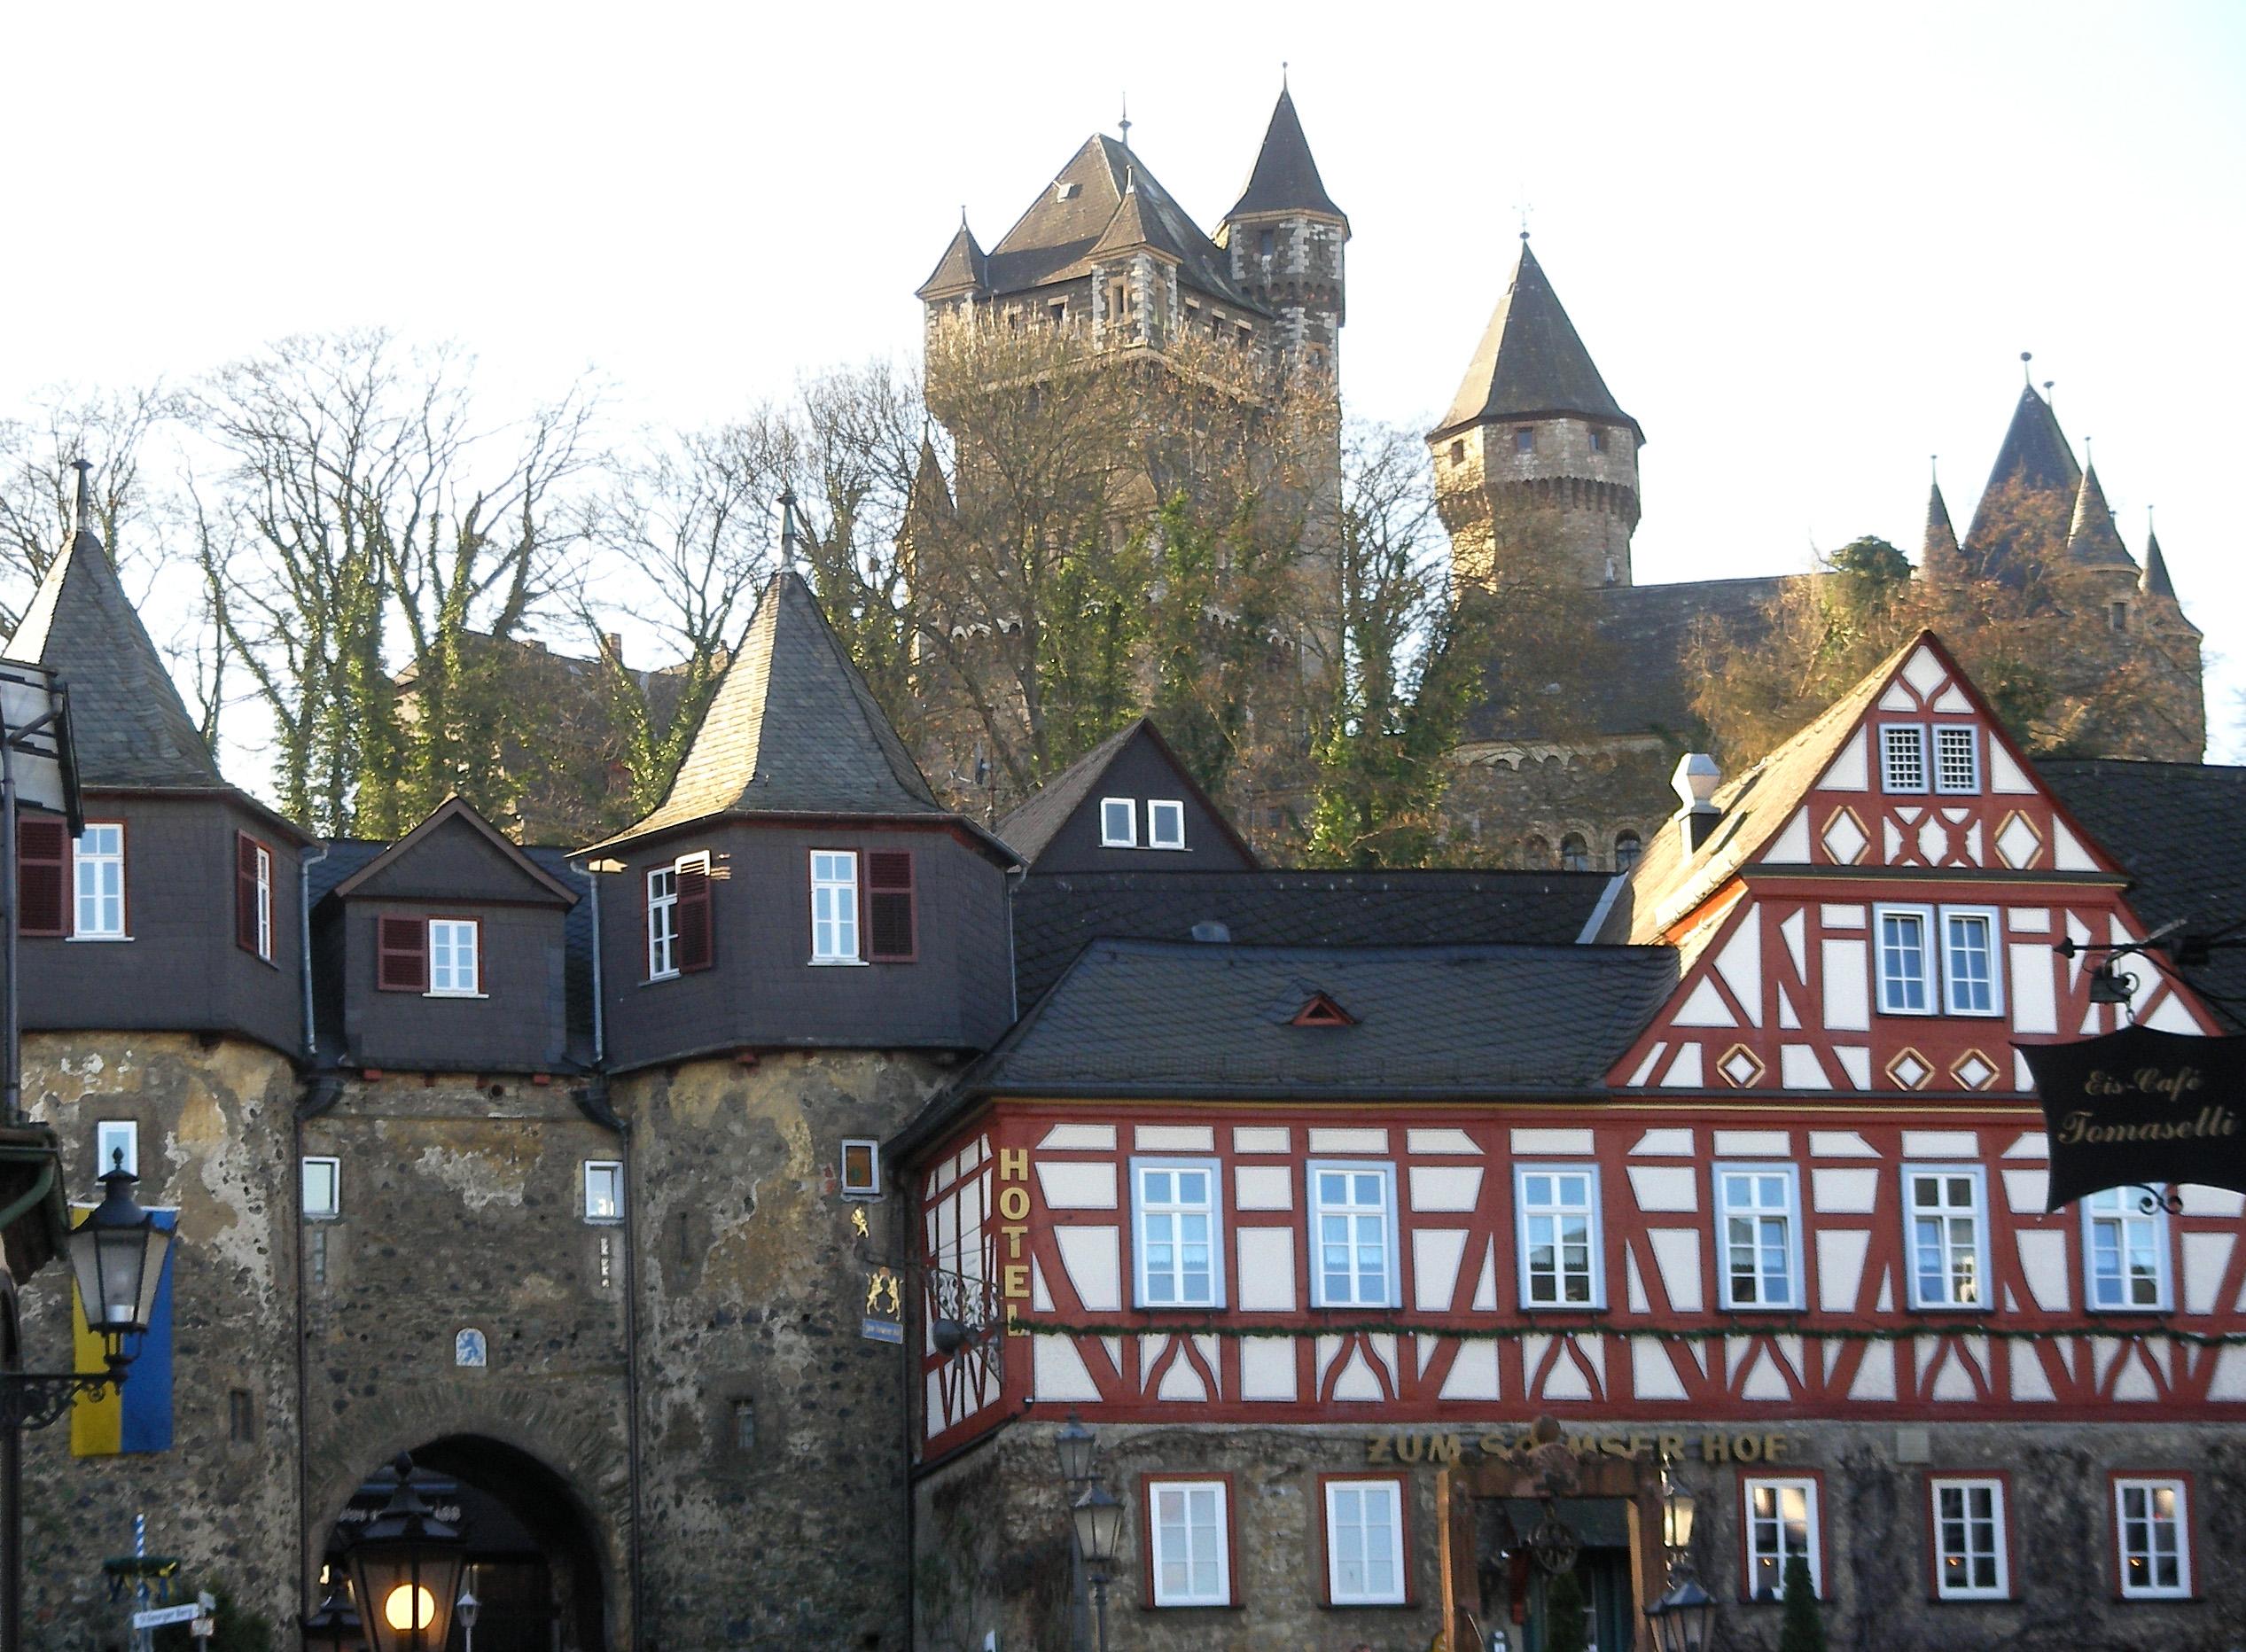 Braunfels Solmser Hof